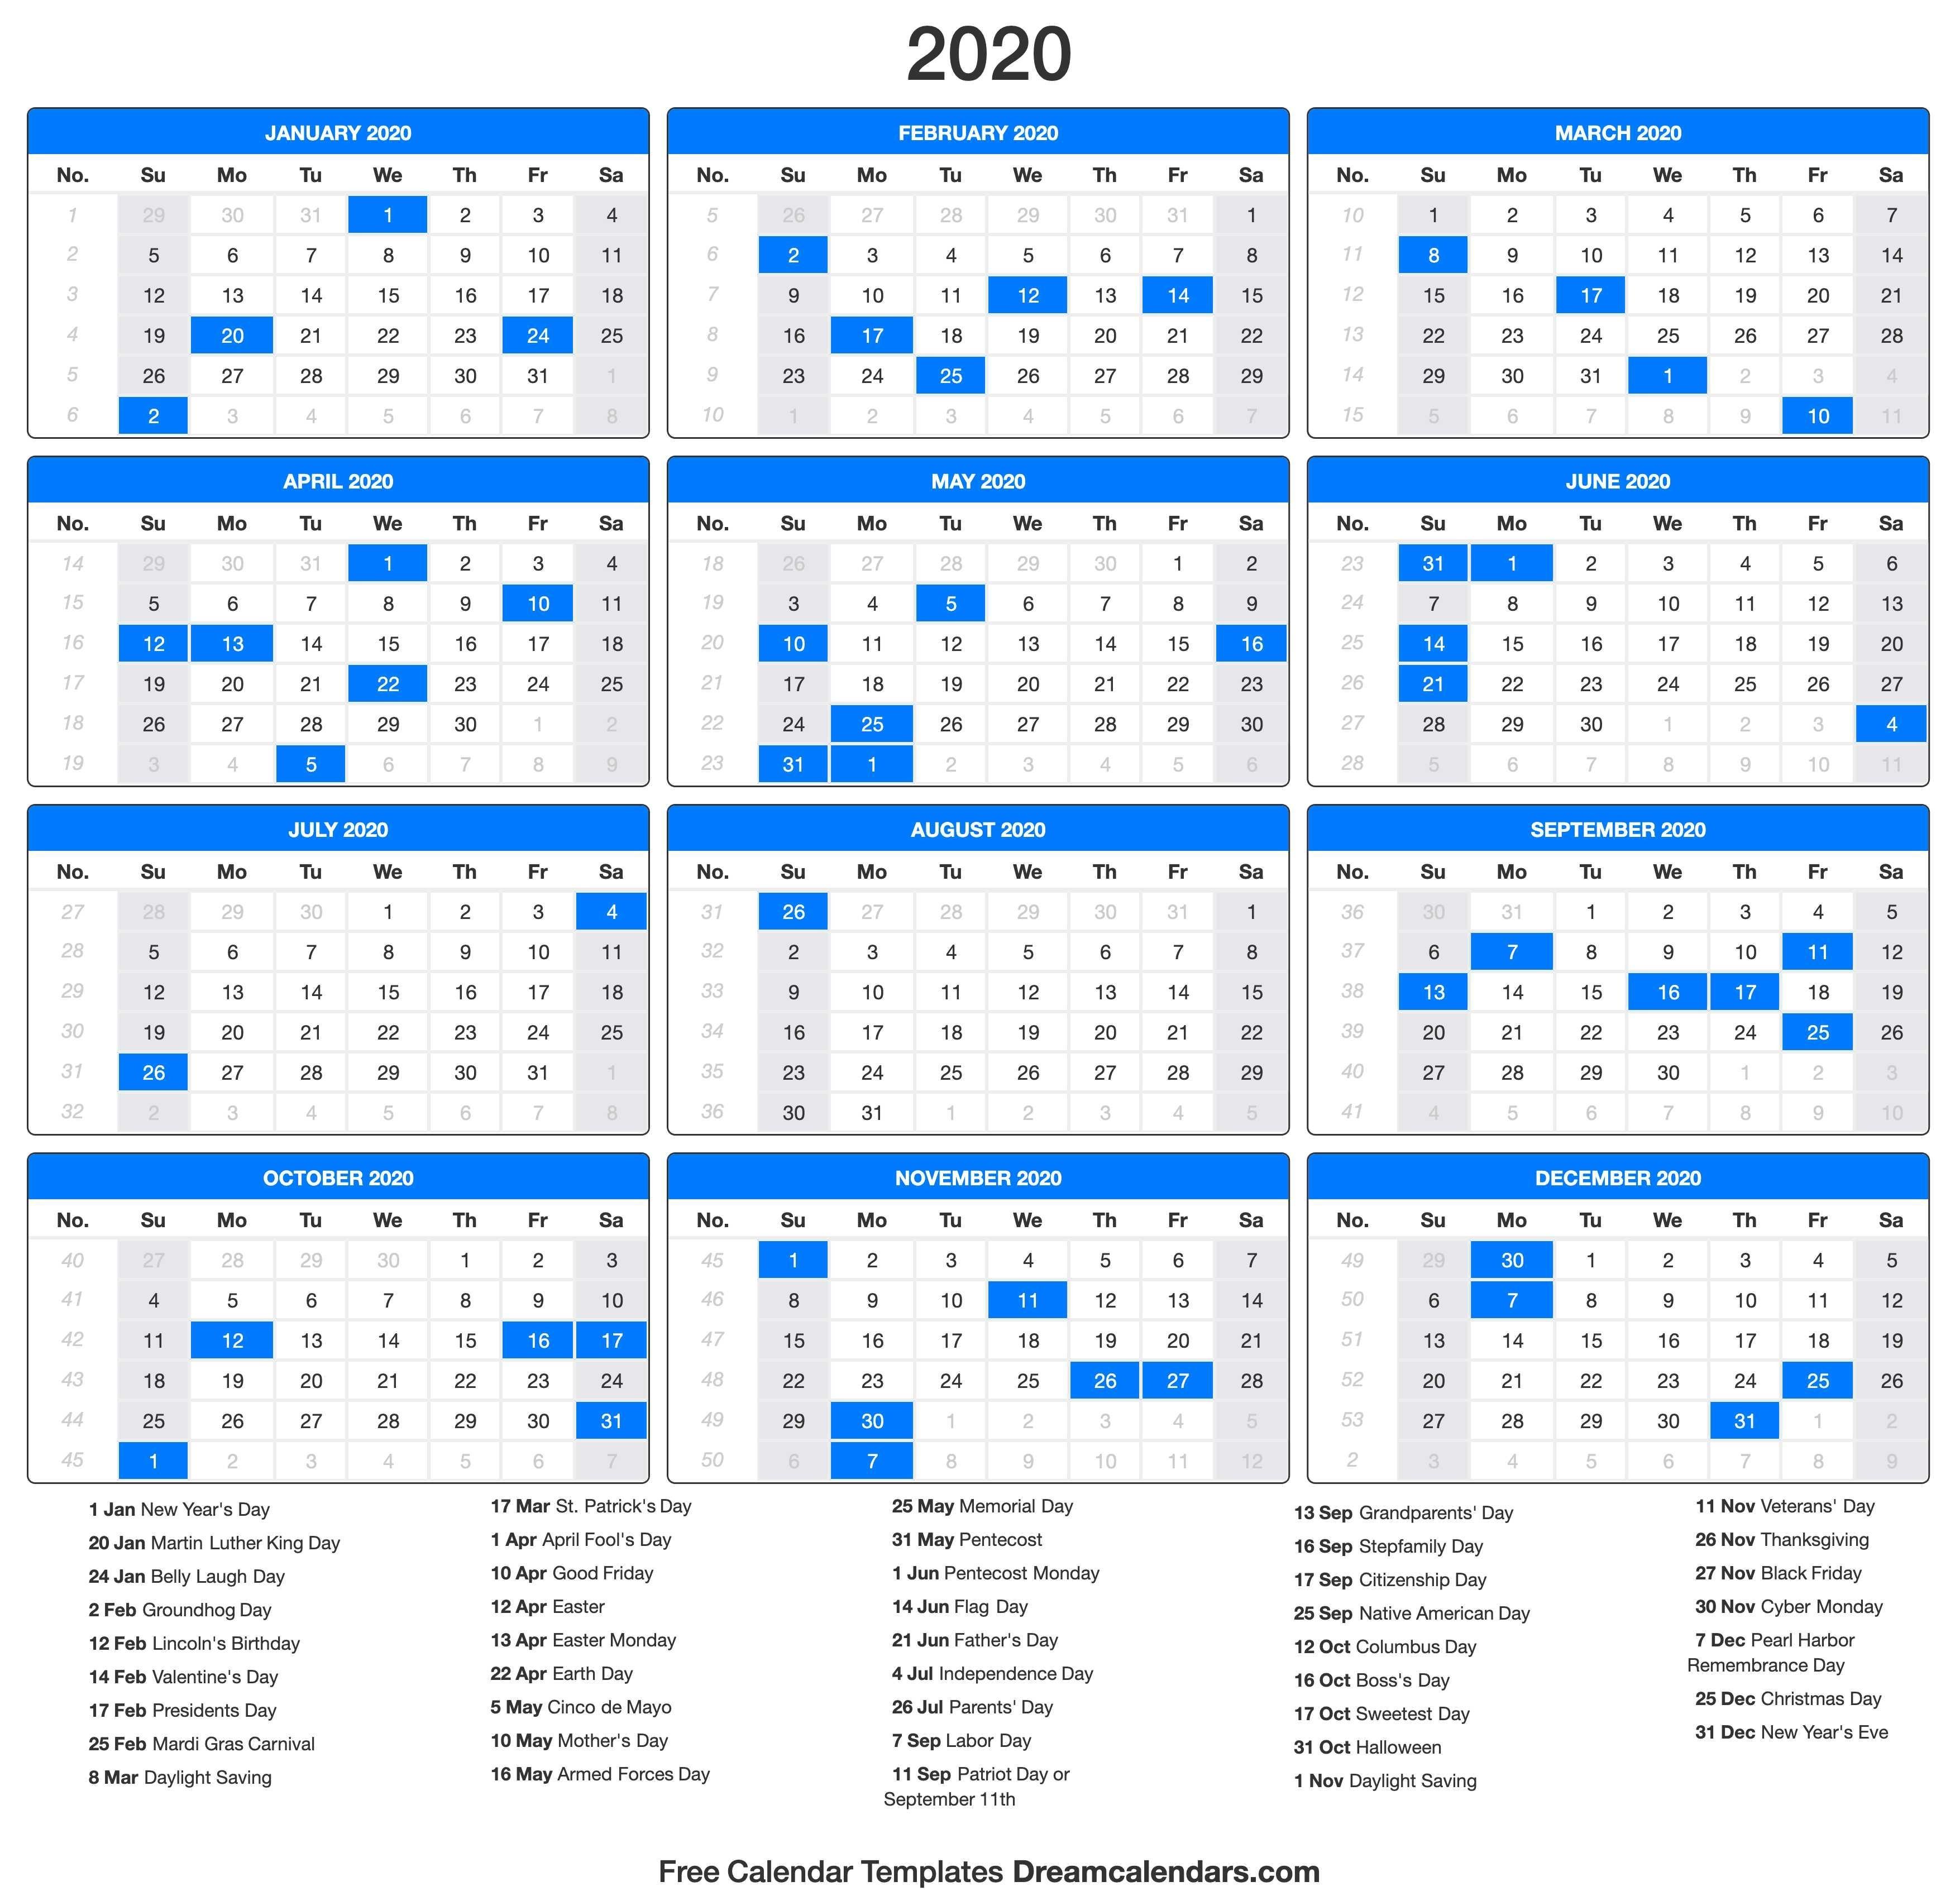 Make A Great 2020 Calendar Free! | Posts By Helena Orstem-2020 Calendar Template With Catholic Holidays